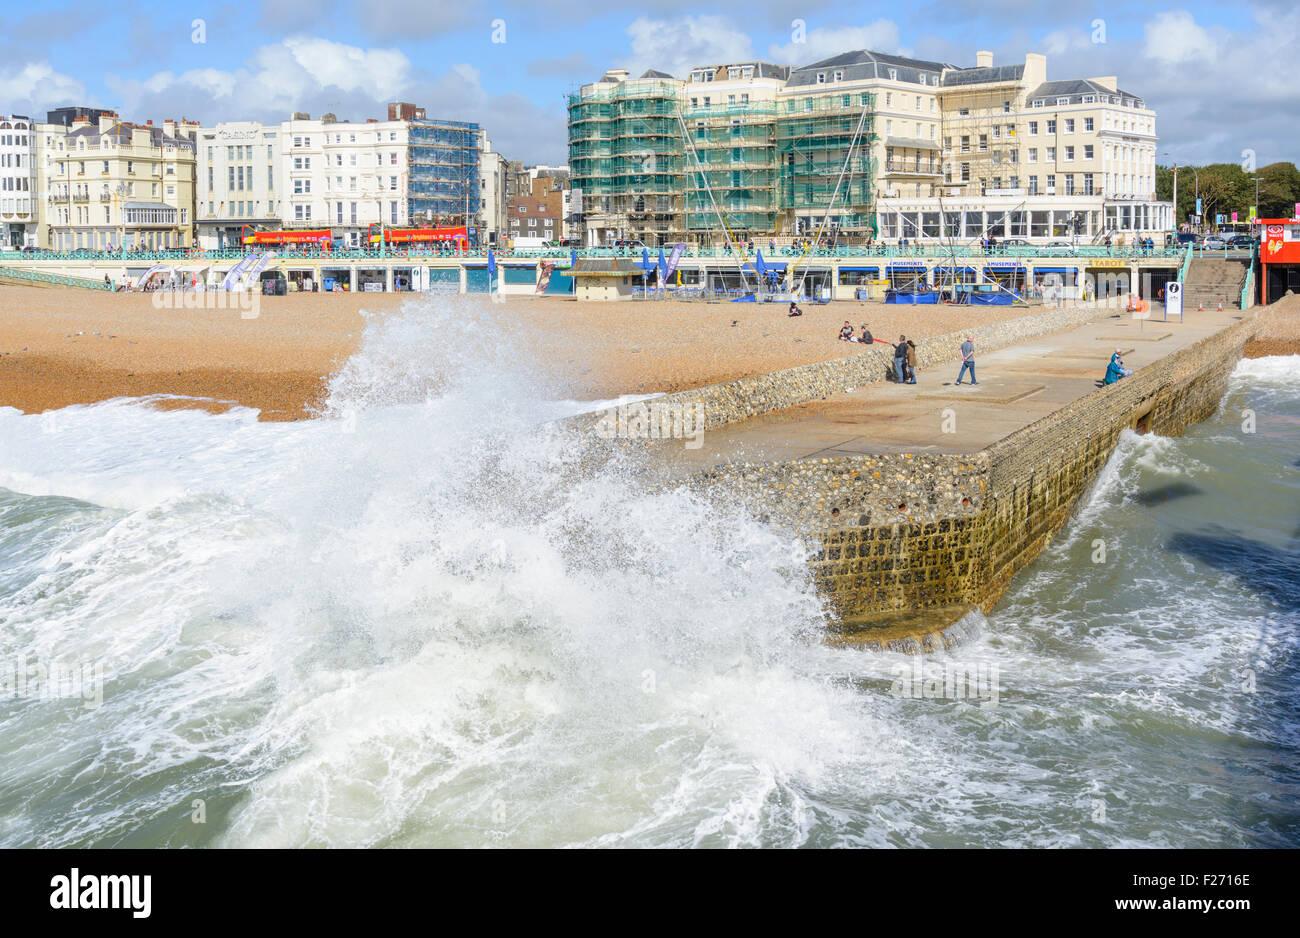 Brighton groyne / Groin. Waves splashing over the old groyne at the seafront in Brighton, East Sussex,UK. Brighton Stock Photo